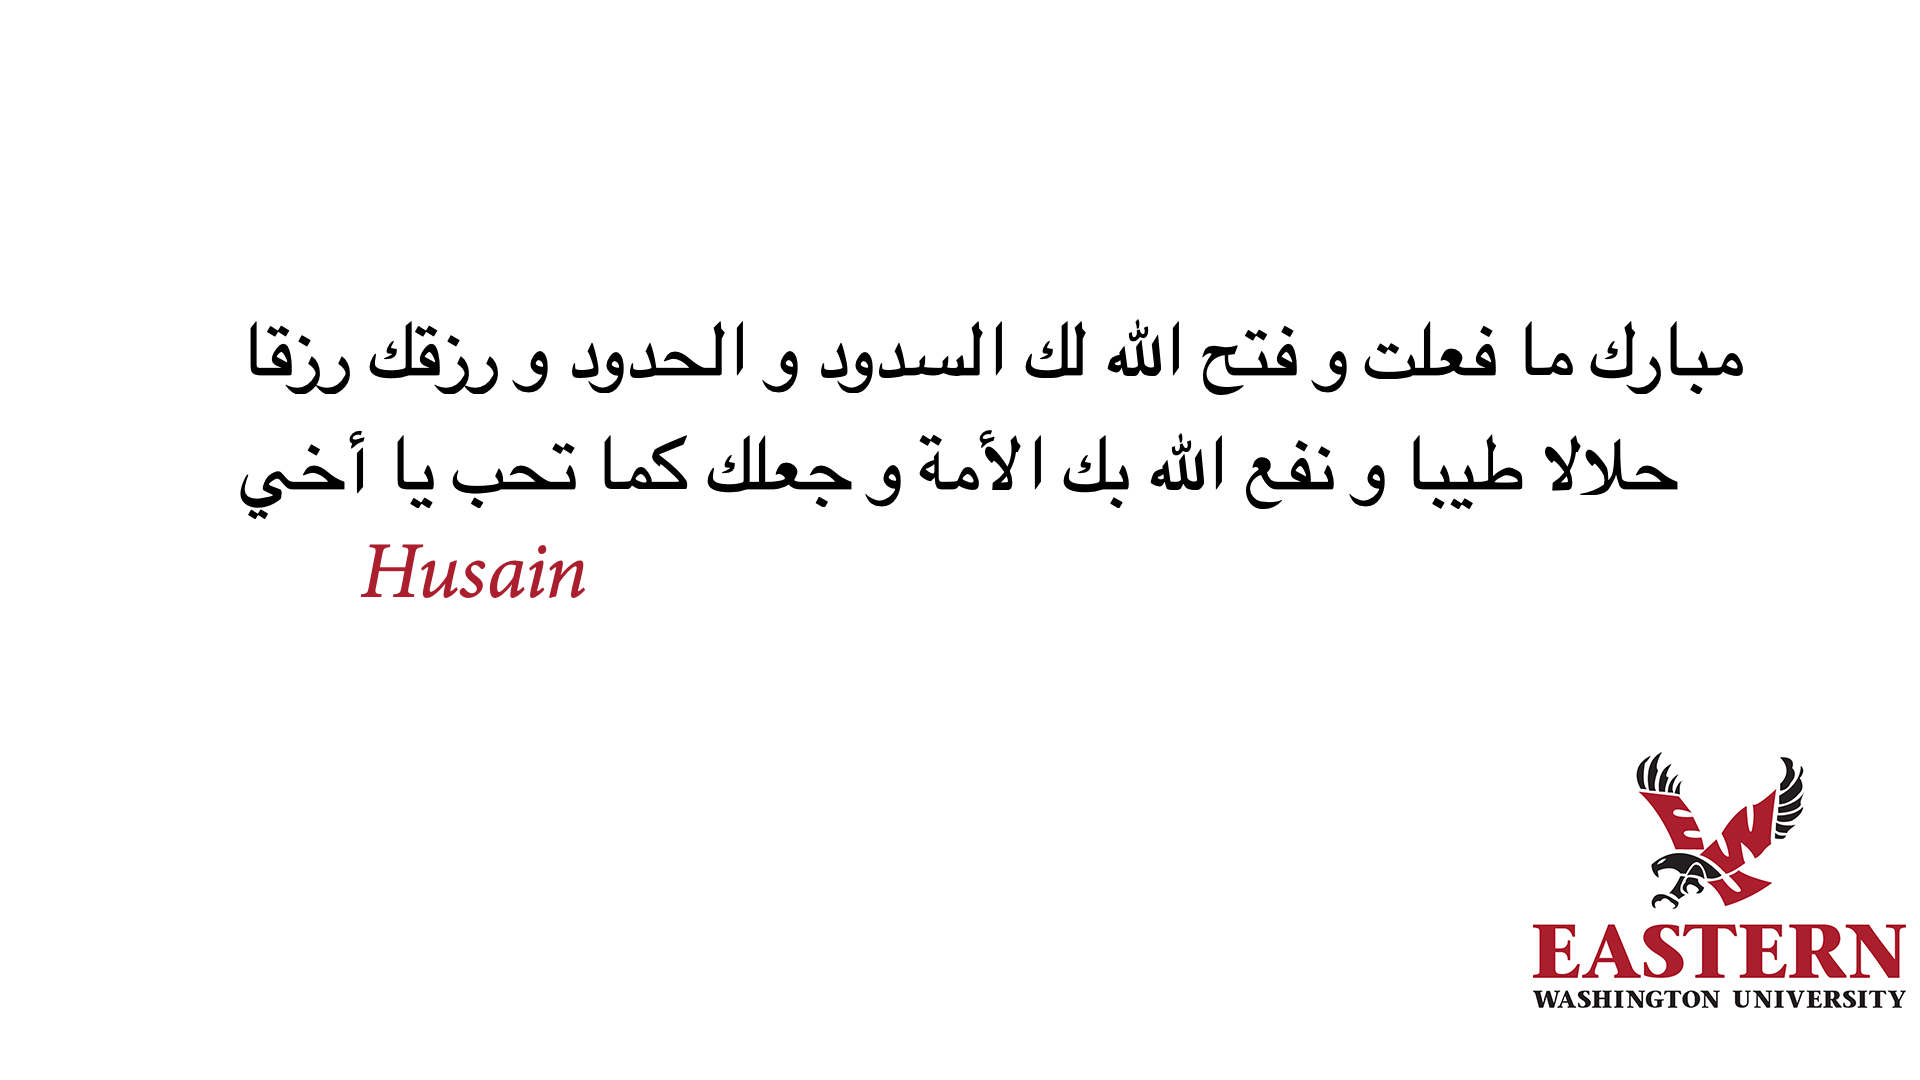 tbi_alqasim-a-alqasim_8148.png